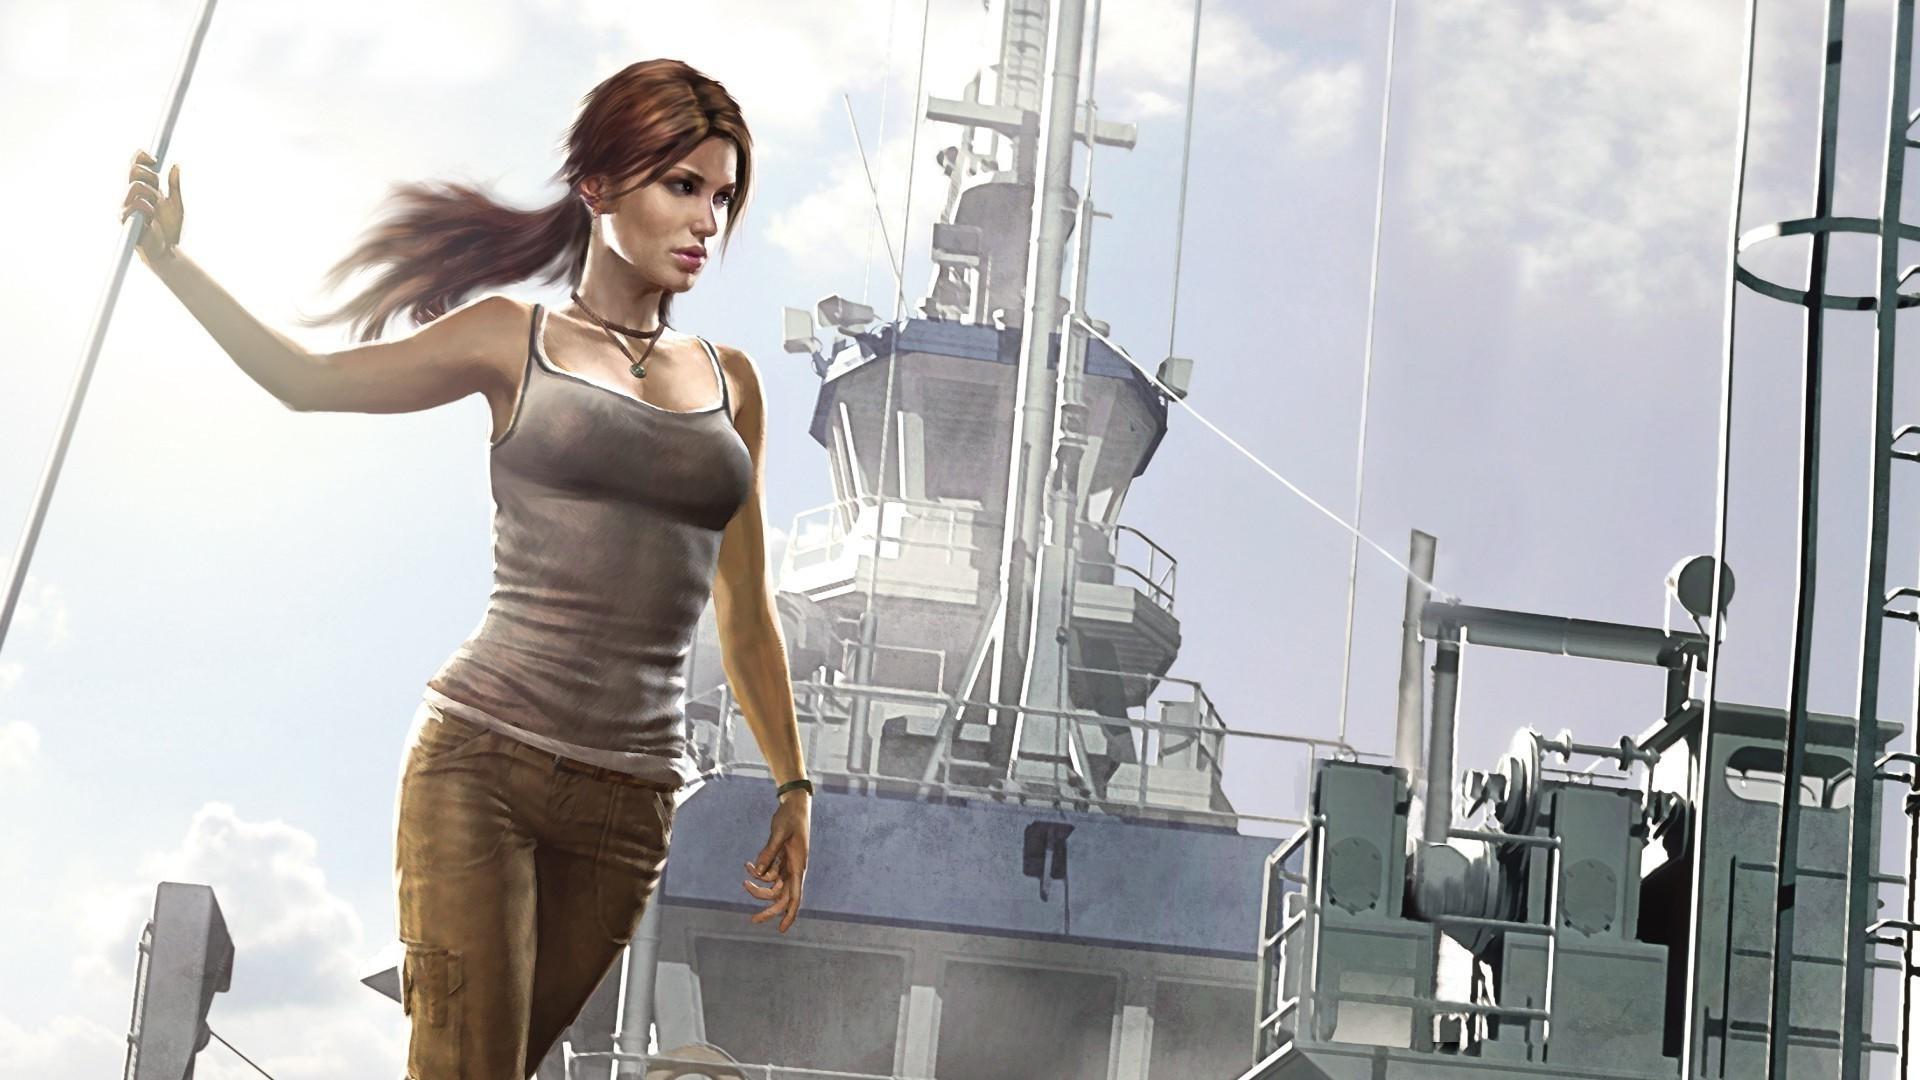 video Games, Video Game Characters, Video Game Girls, Tomb Raider, Lara  Croft, Fan Art, Artwork, Tank Top Wallpapers HD / Desktop and Mobile  Backgrounds